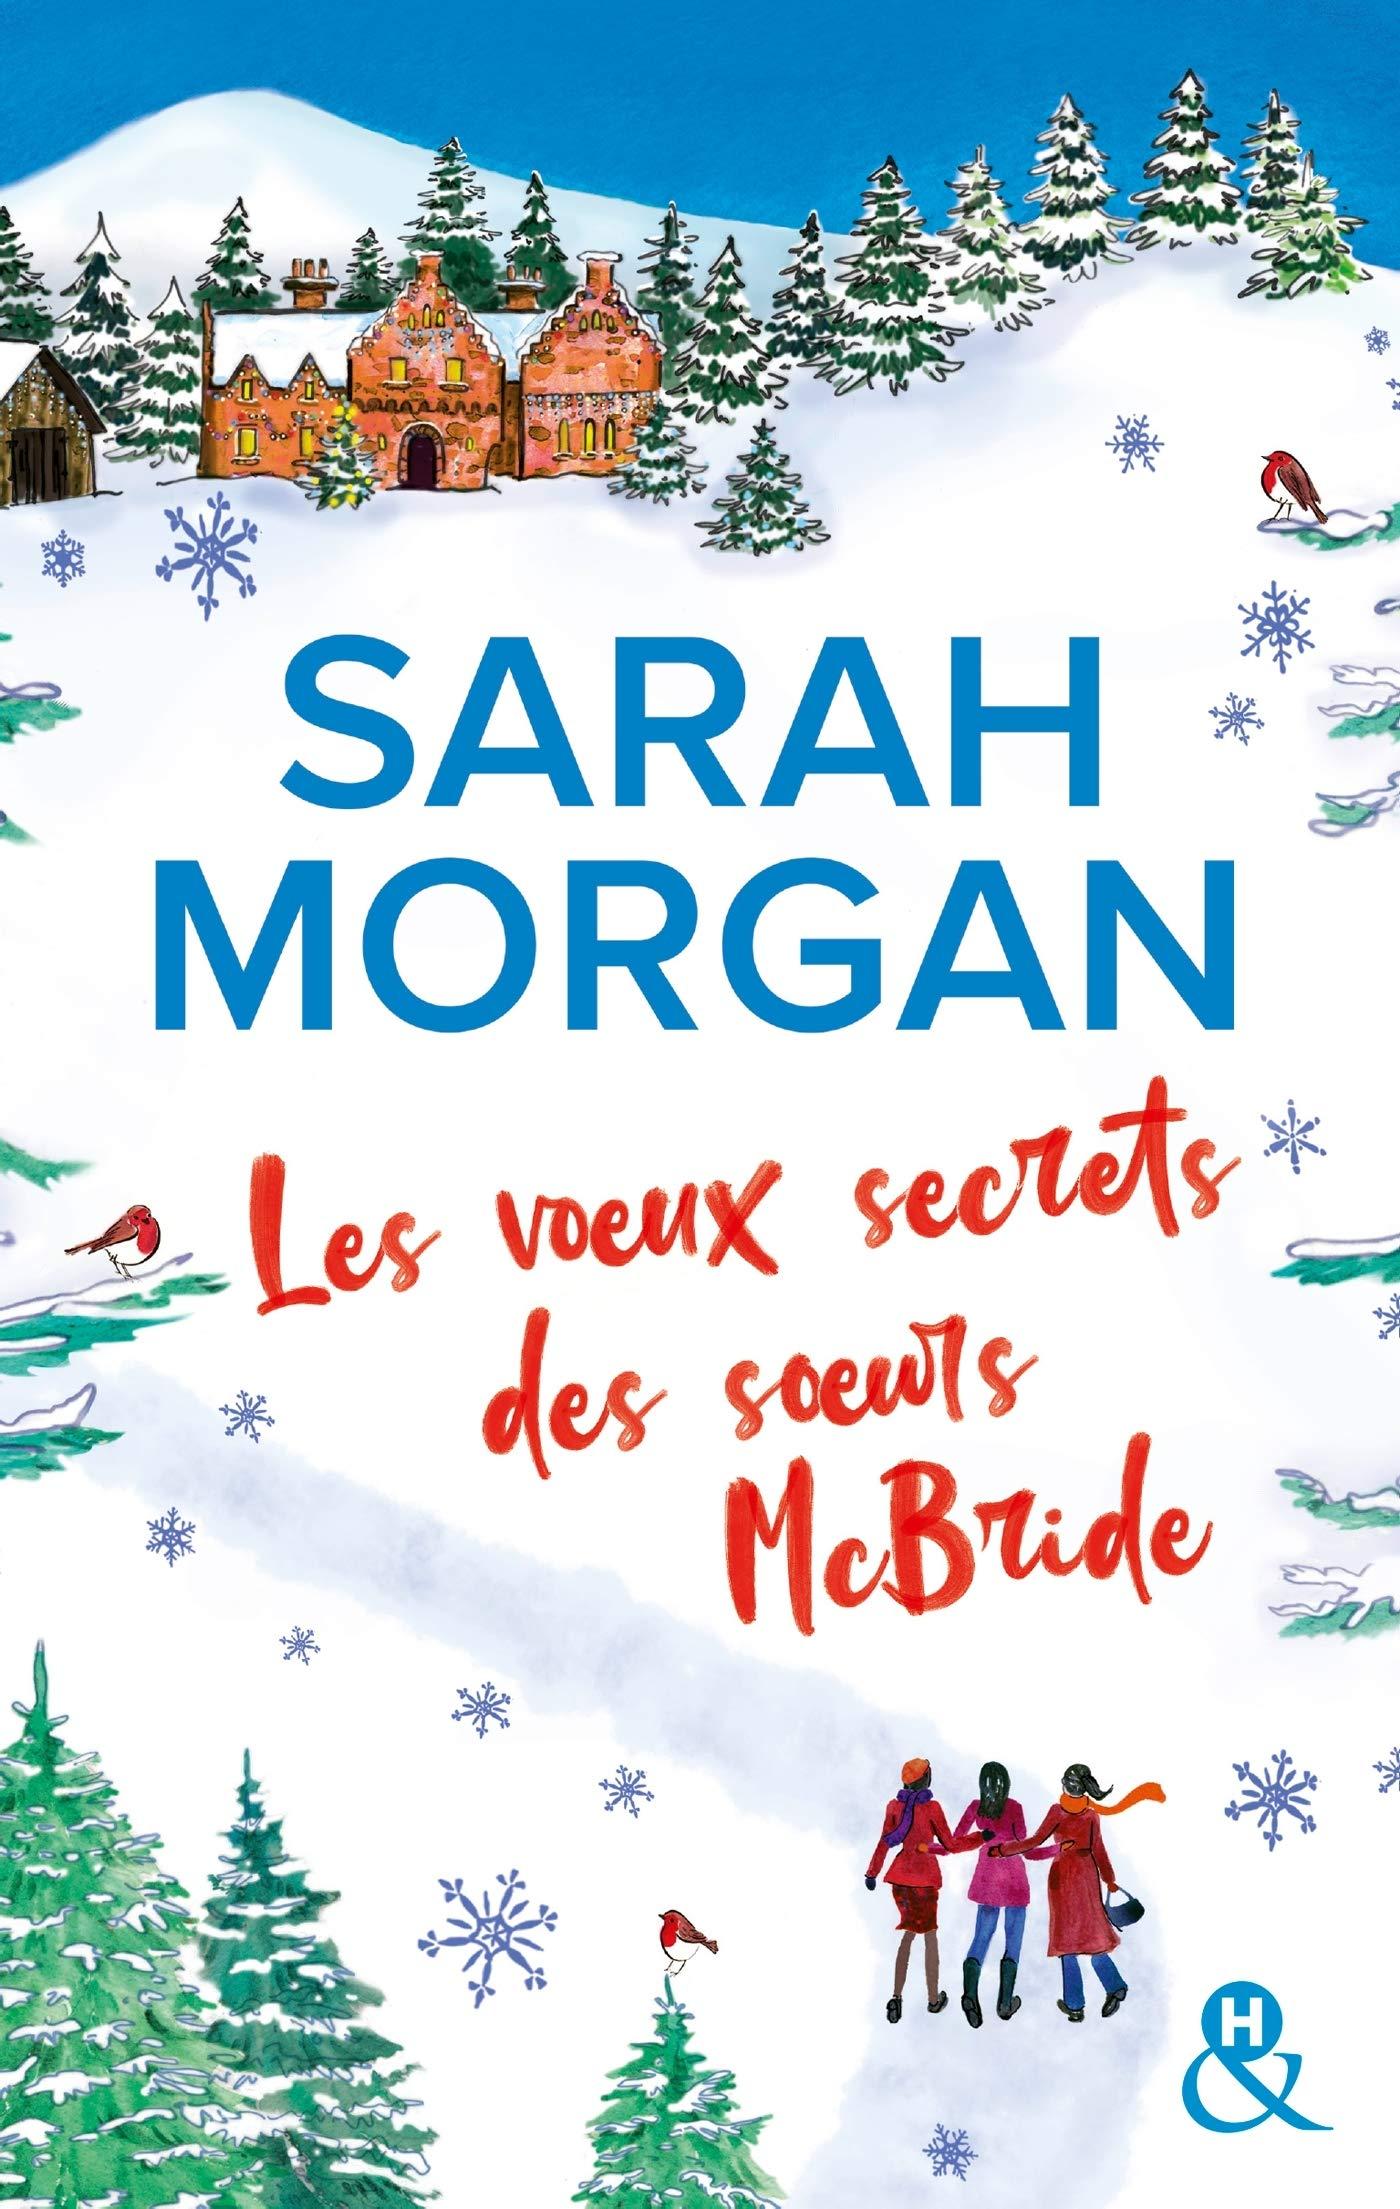 Les vœux secrets des soeurs McBride de Sarah Morgan 81pbvs10